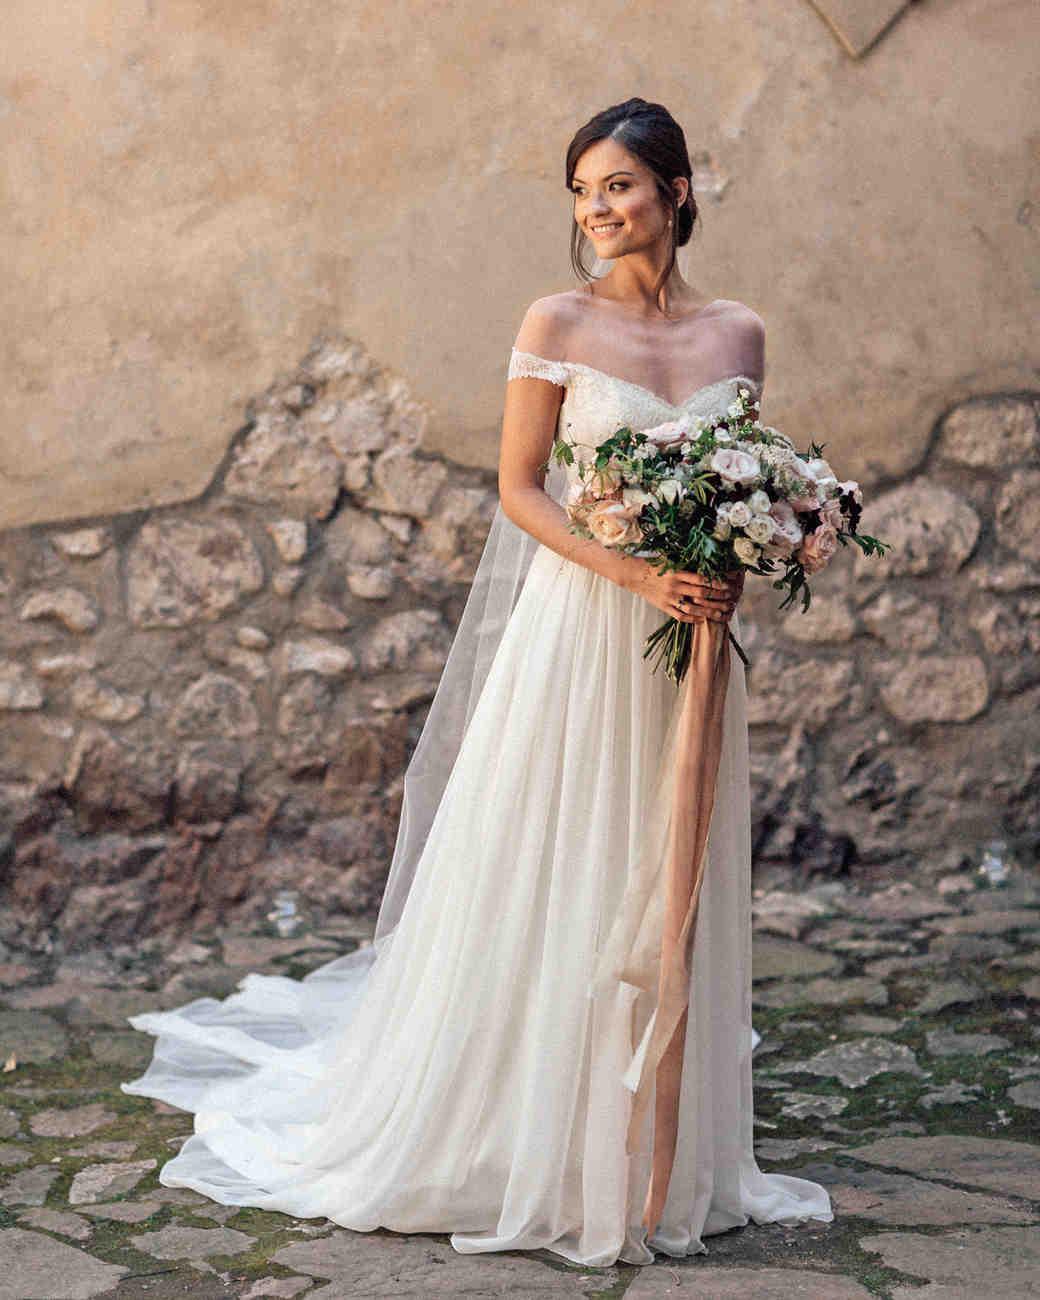 natalie paul wedding bride on stone path